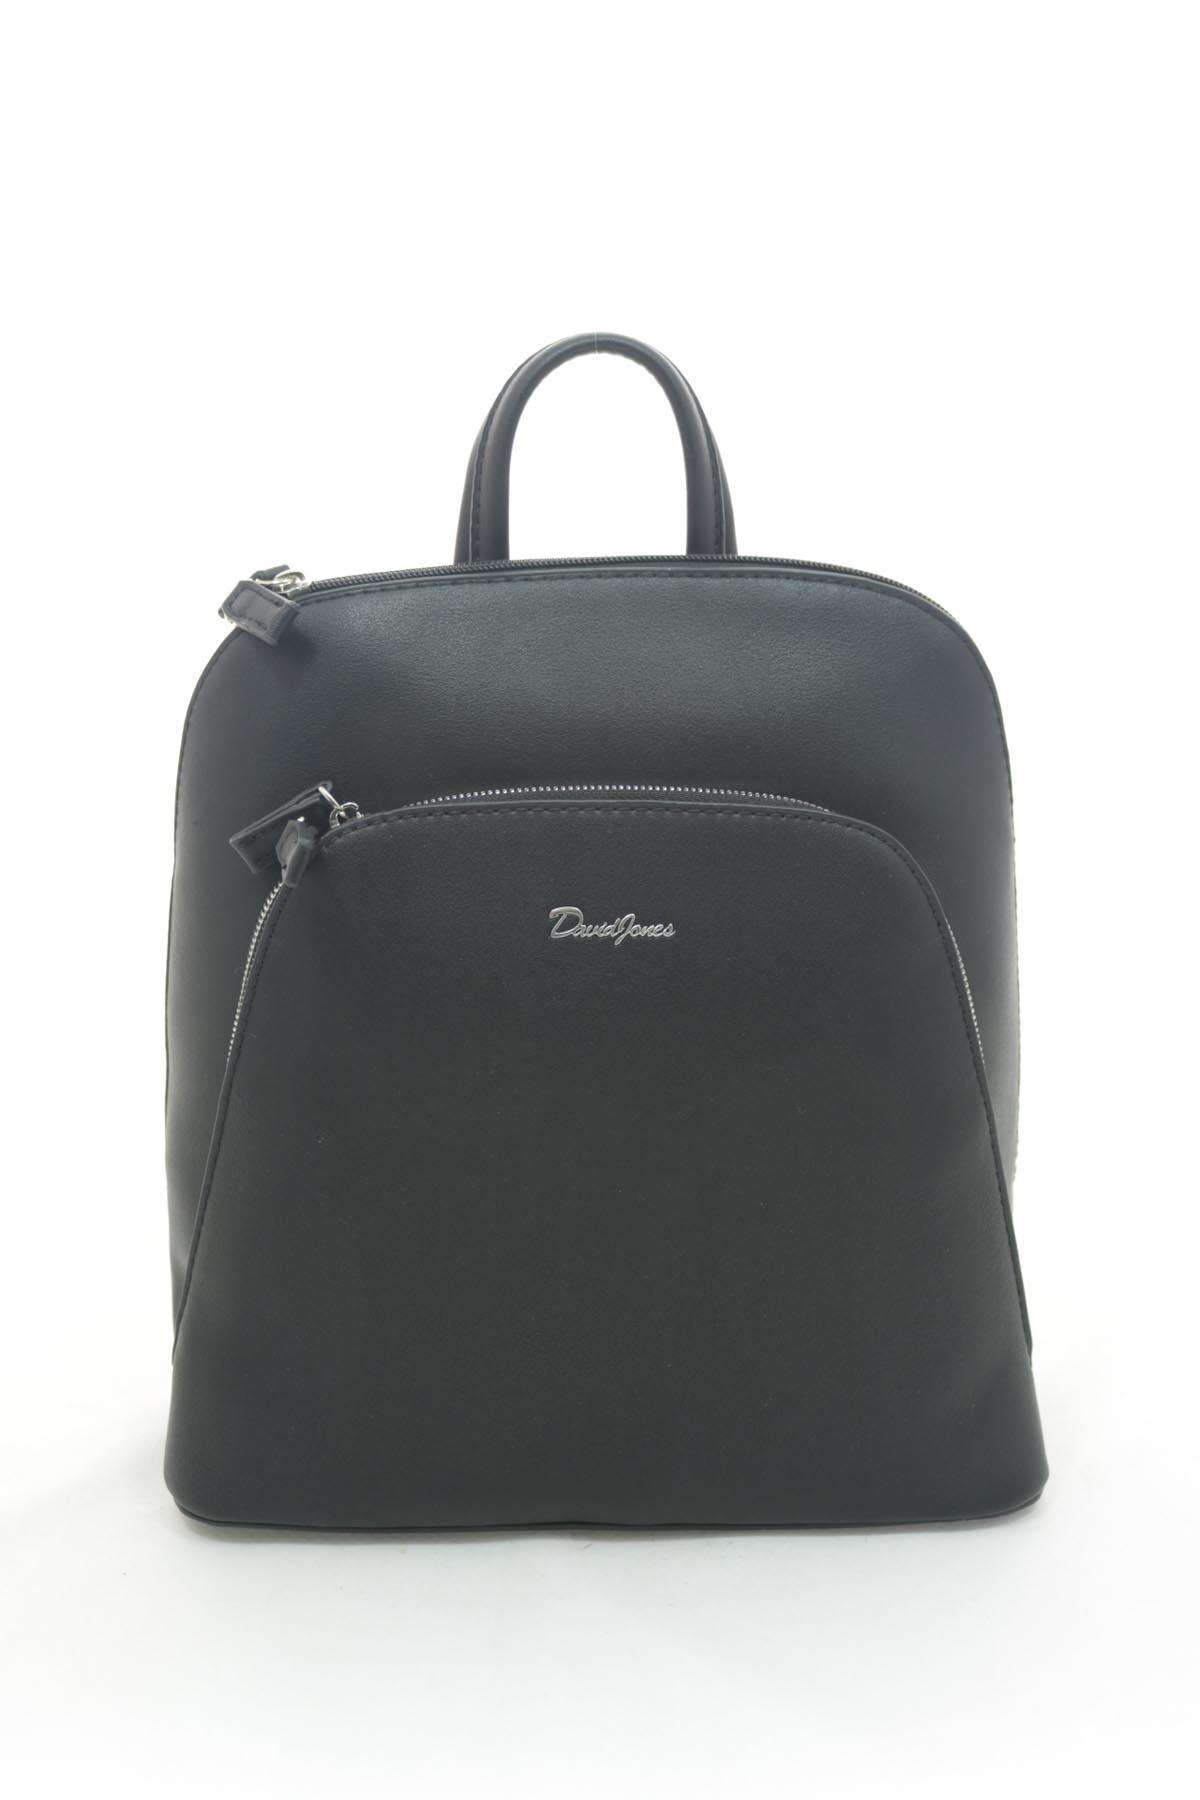 Рюкзак David Jones 5300 оптом